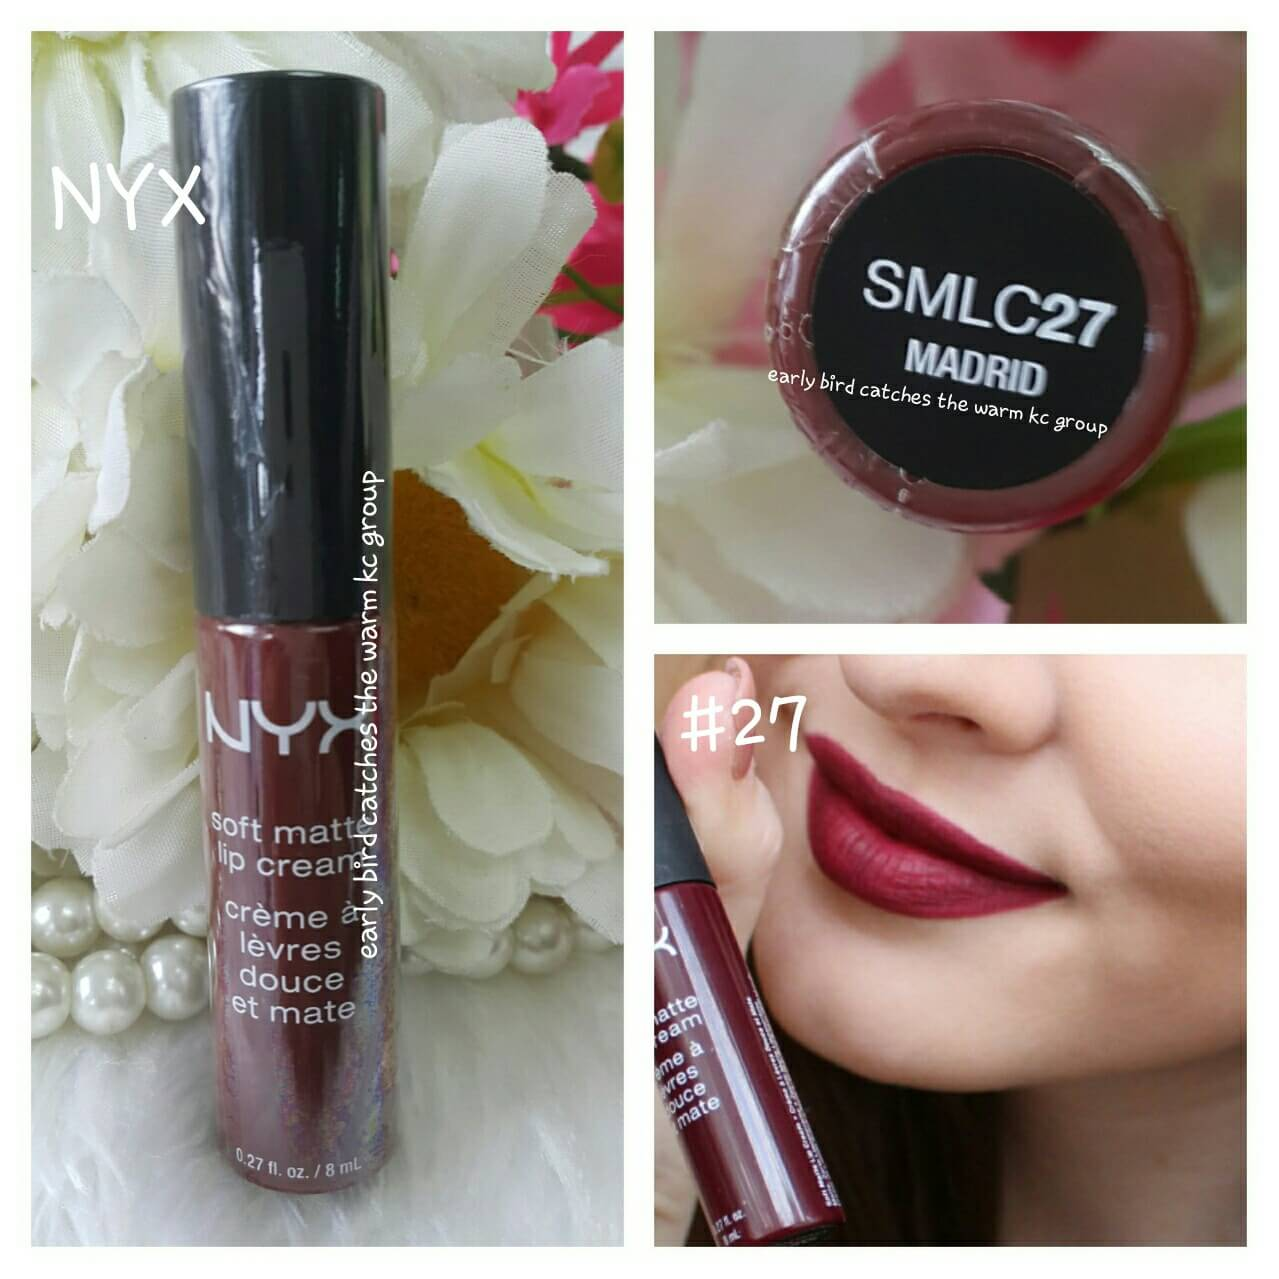 Nyx Soft Matte Lip Cream 27 Madrid Inspired By Lnwshop Com